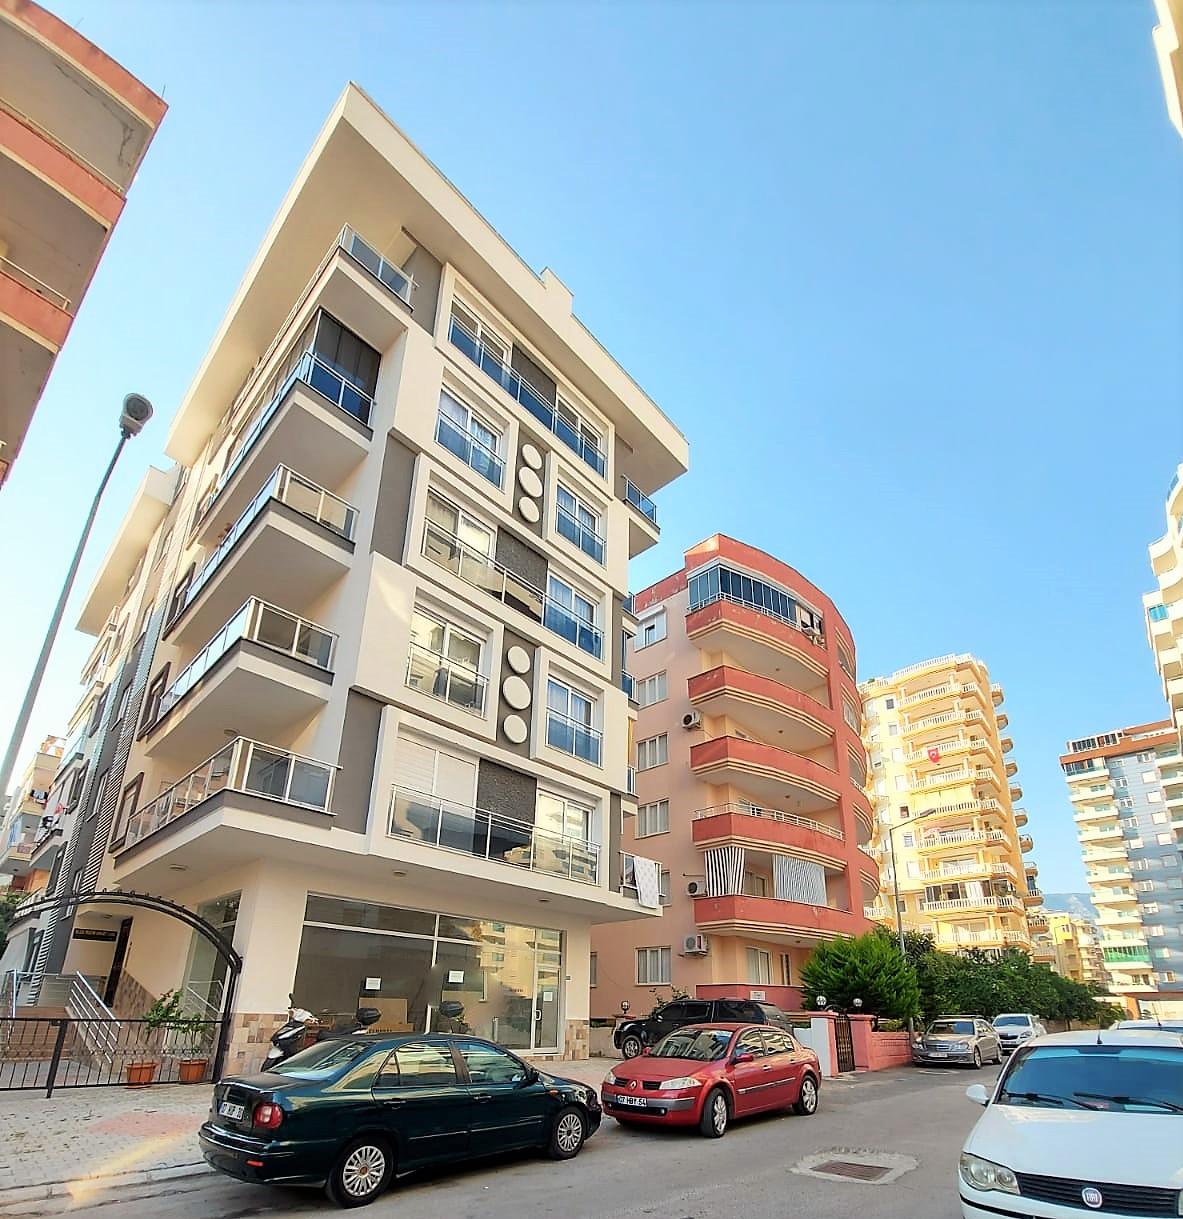 Меблированная квартира 1+1 в районе Махмутлар - Фото 1